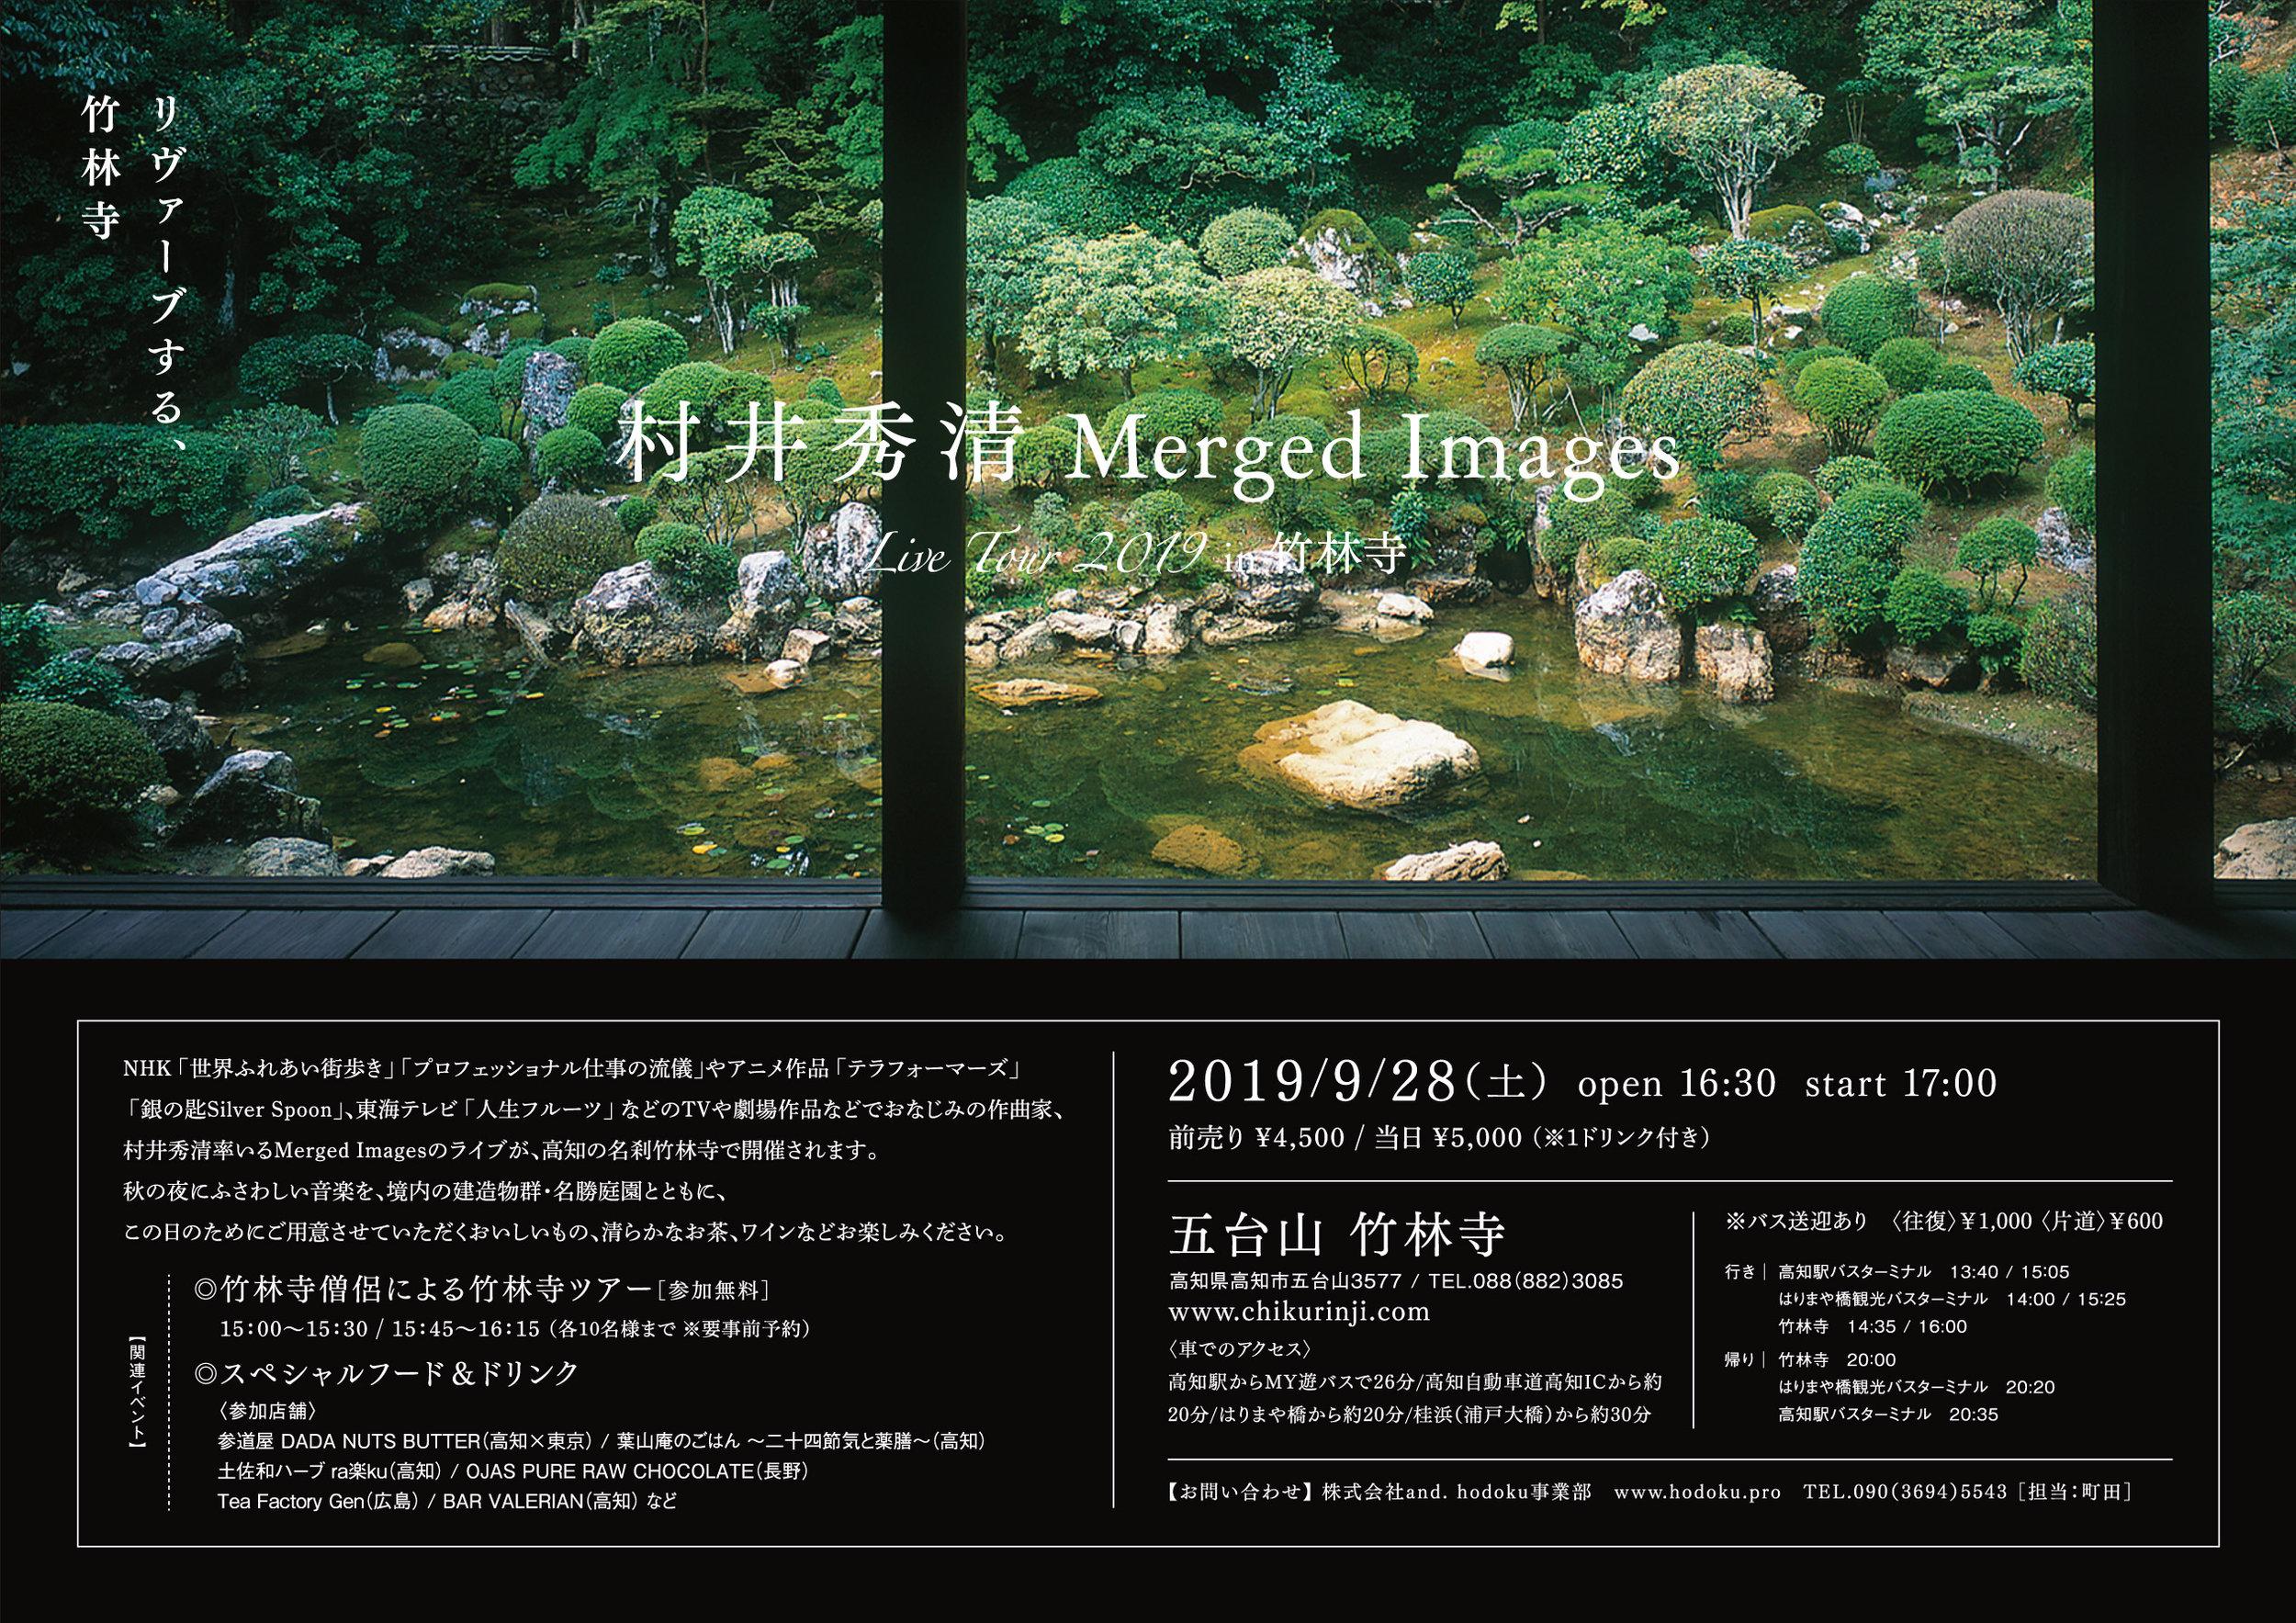 Merged-Imaged2019_Flyer_01.jpg